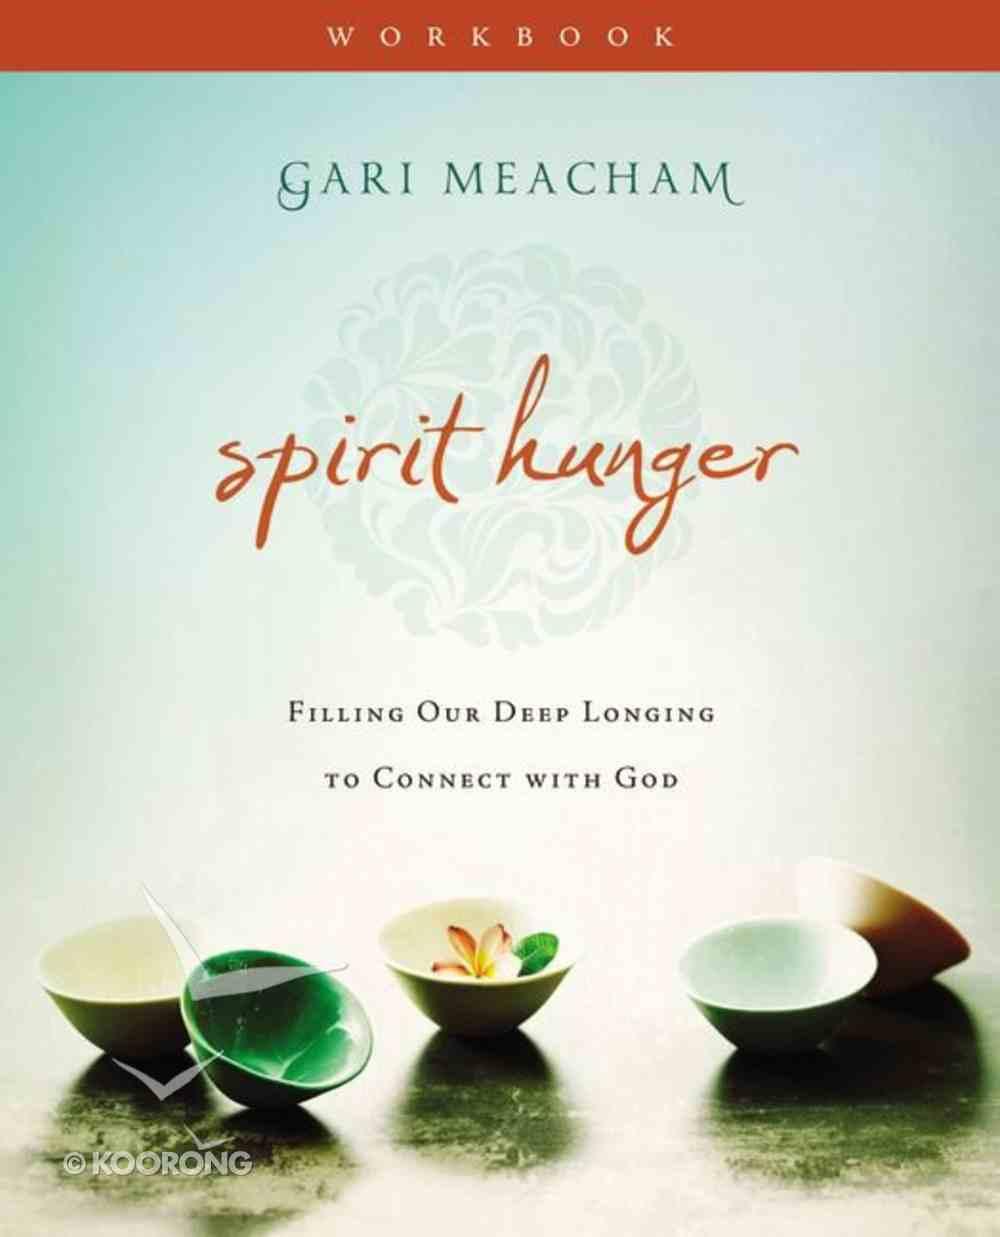 Spirit Hunger (Workbook) Paperback